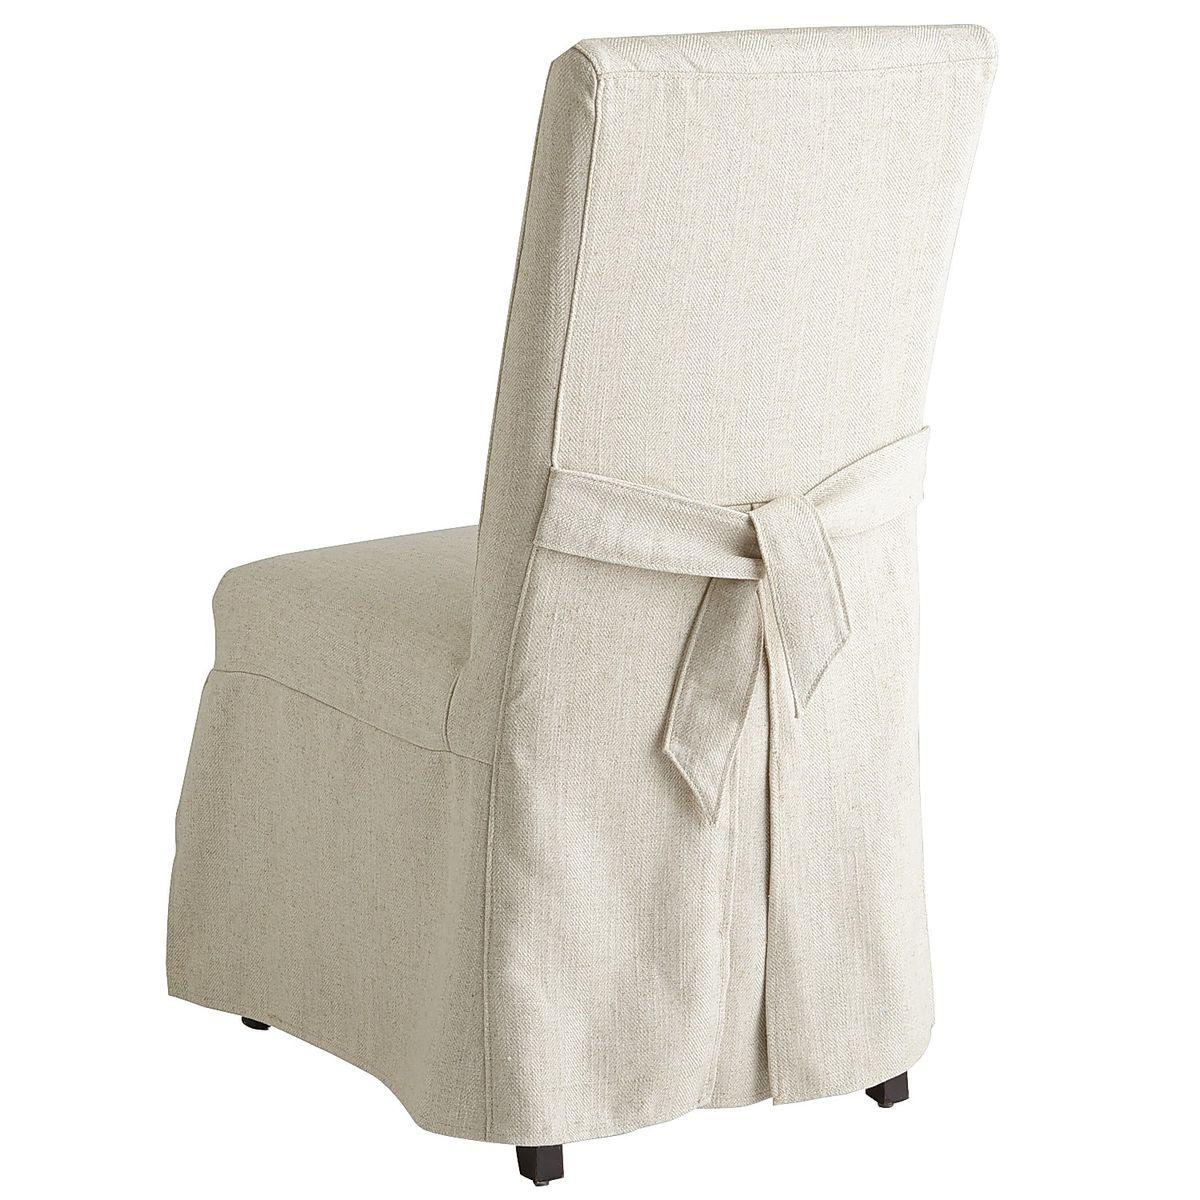 Dana Flax Chair Slipcover Pier 1 Imports Slipcovers For Chairs Slipcovers Dining Chair Slipcovers